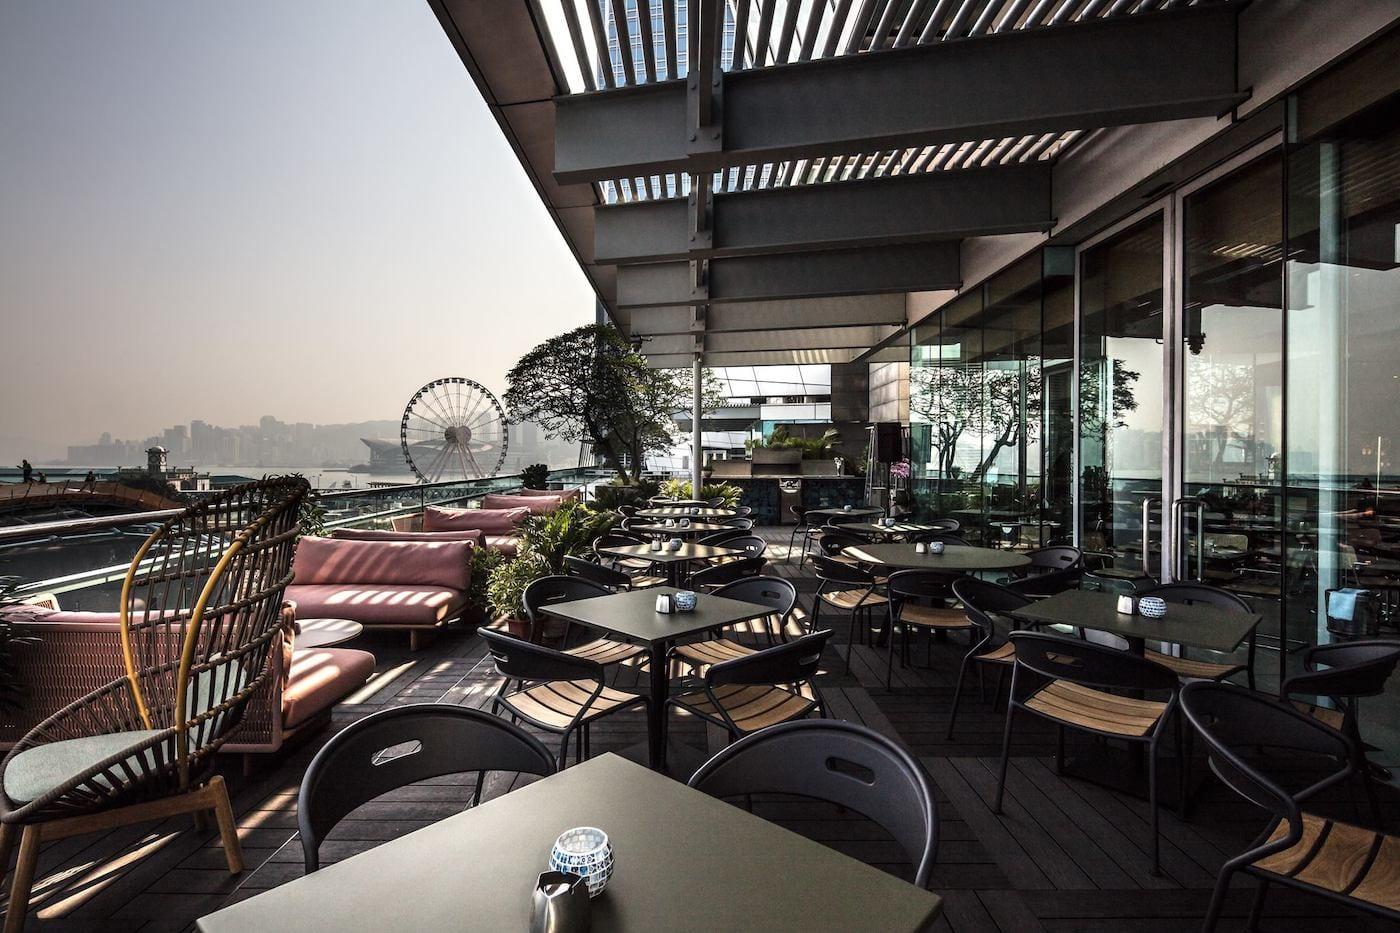 La Rambla by Catalunya terrace   outdoor restaurants in Hong Kong alfresco dining